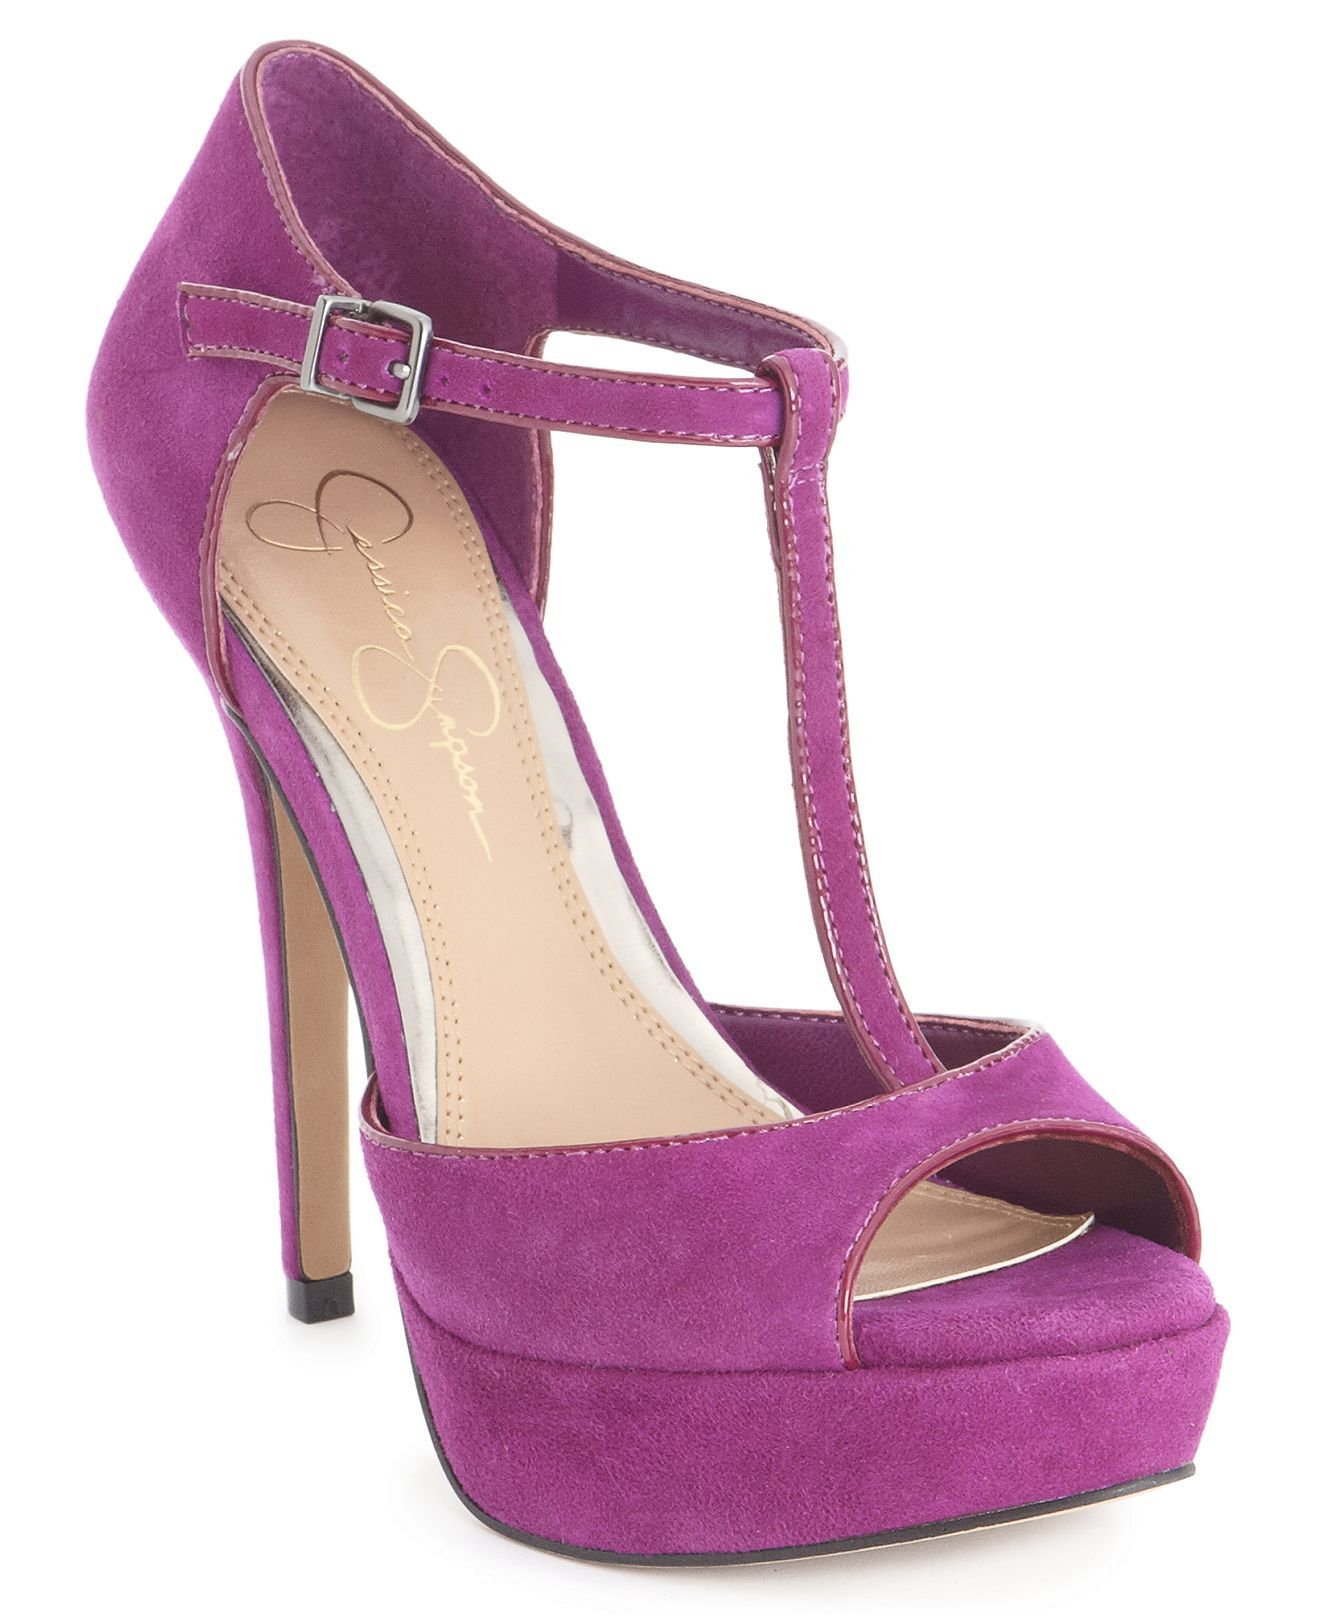 440cdcafa946 Jessica Simpson Shoes